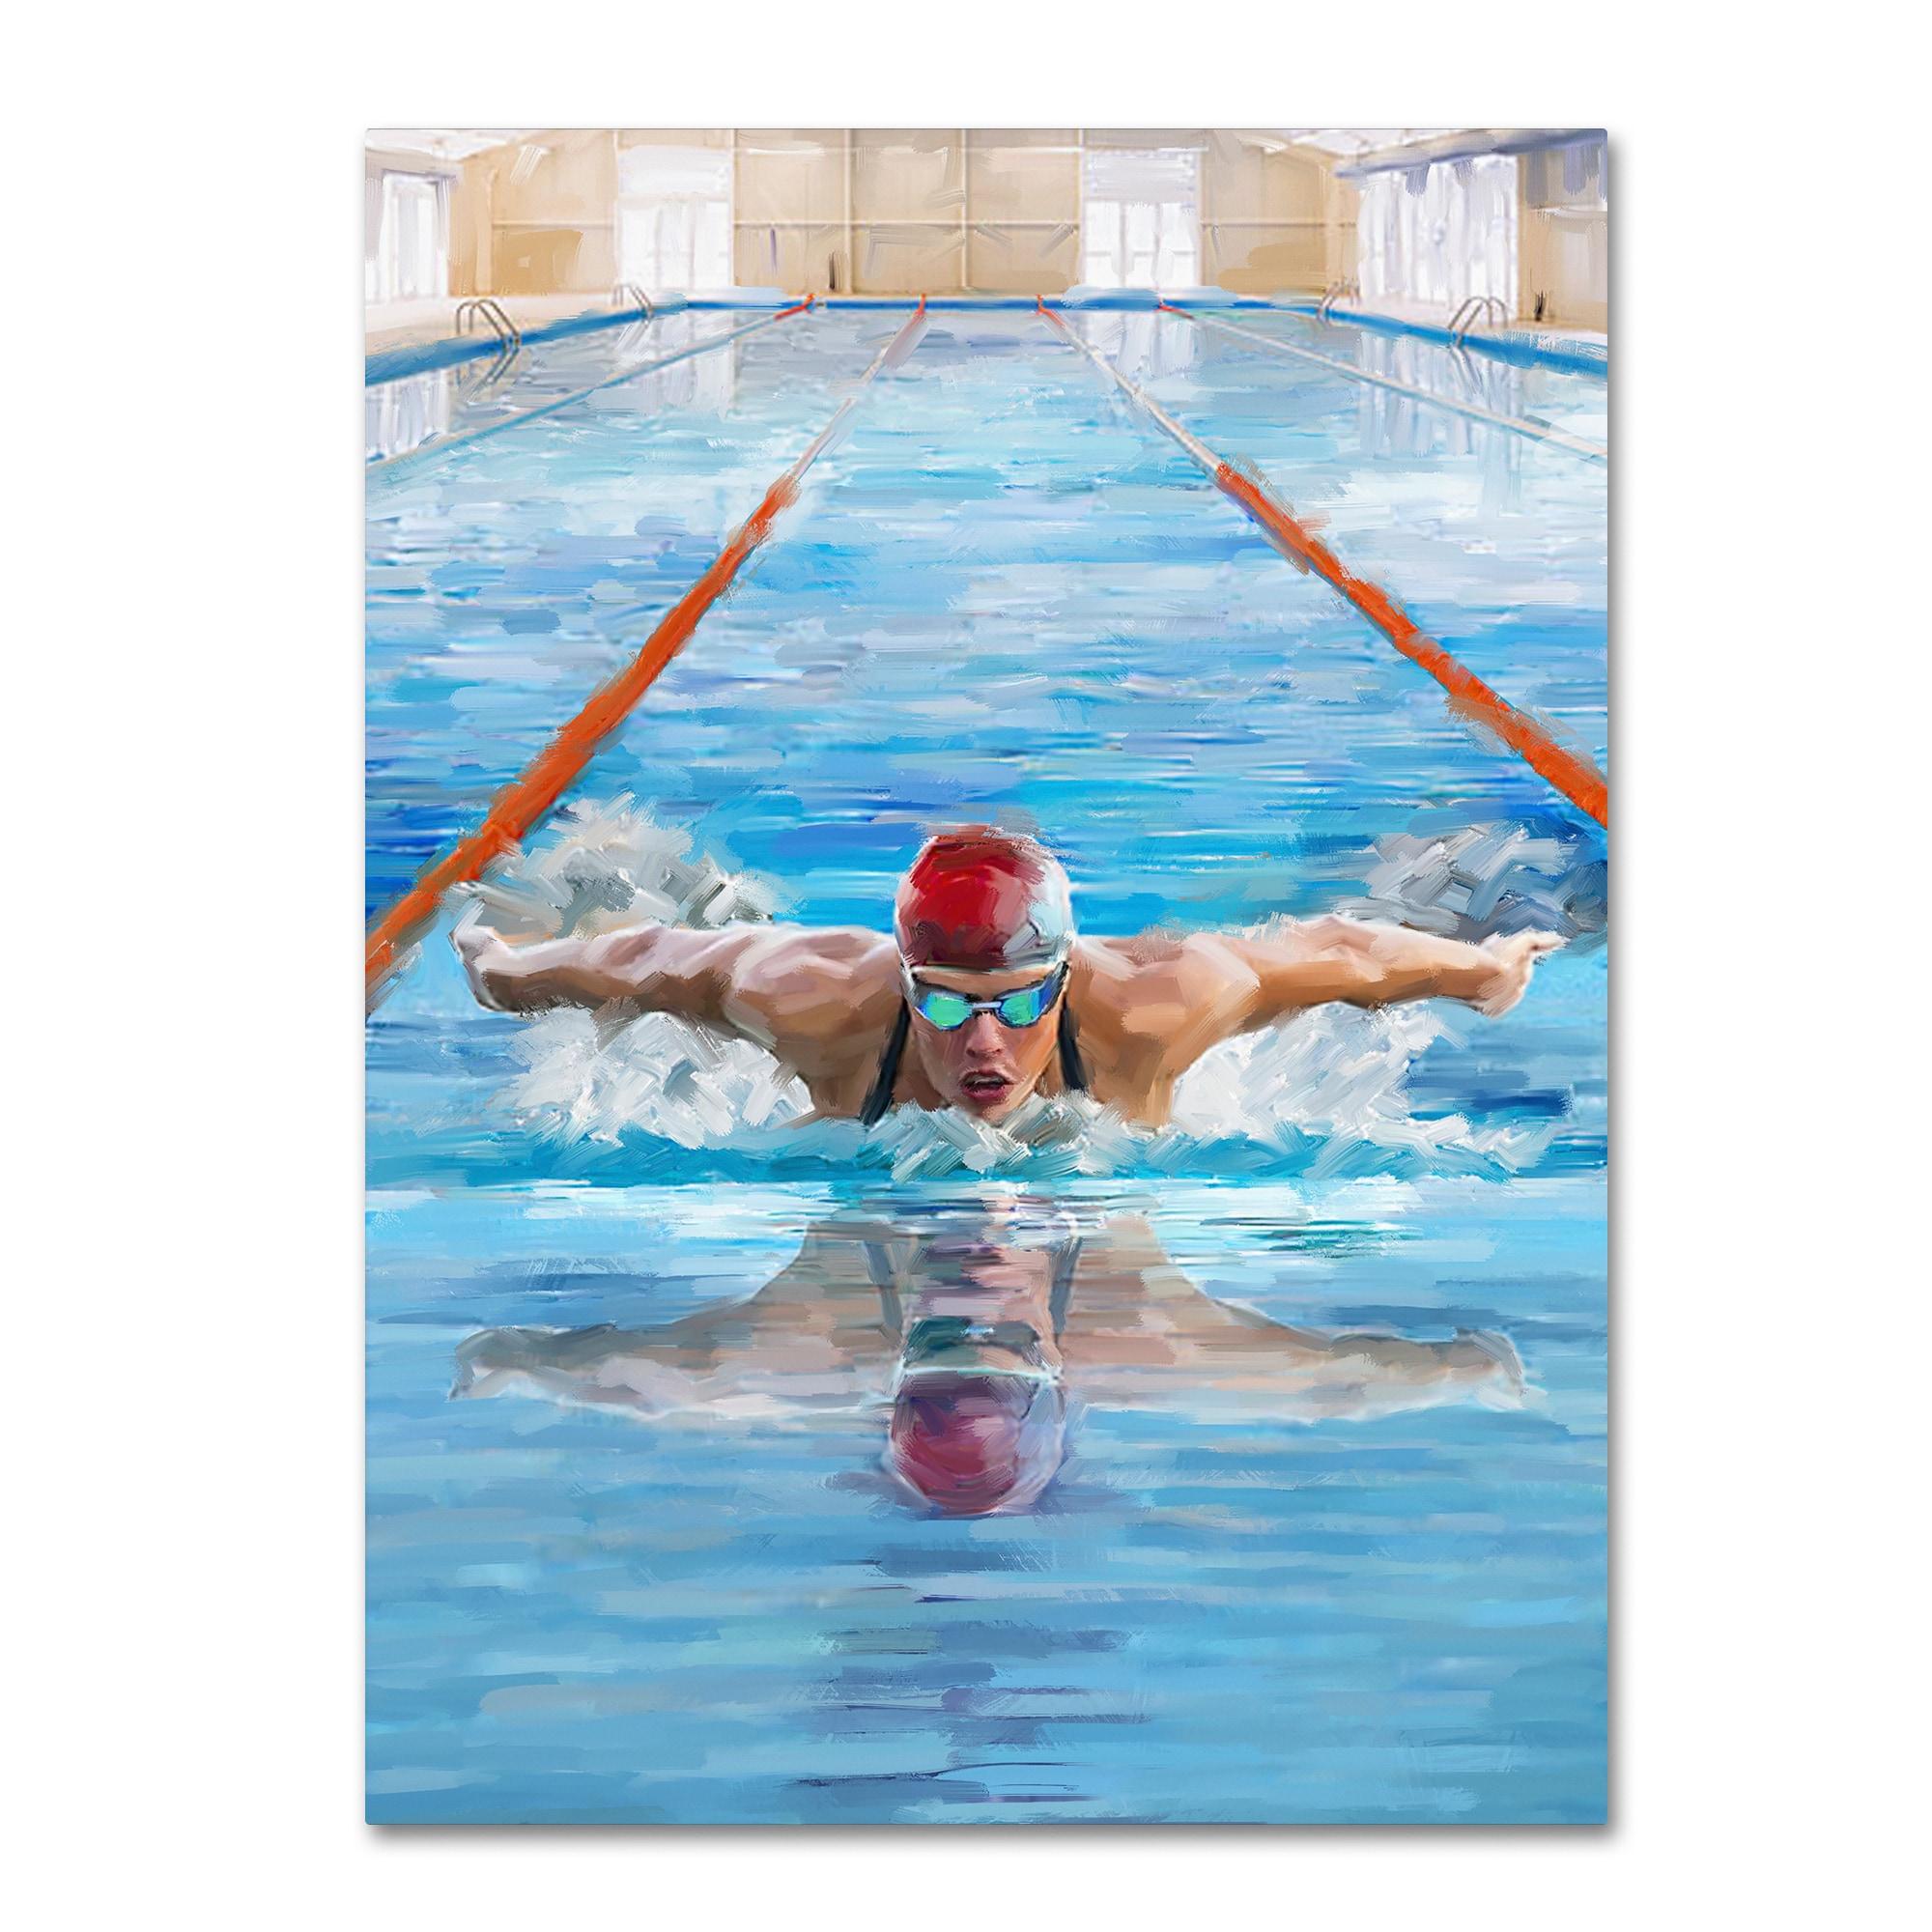 The Macneil Studio 'Swimming' Canvas Art (24x32), Blue pool